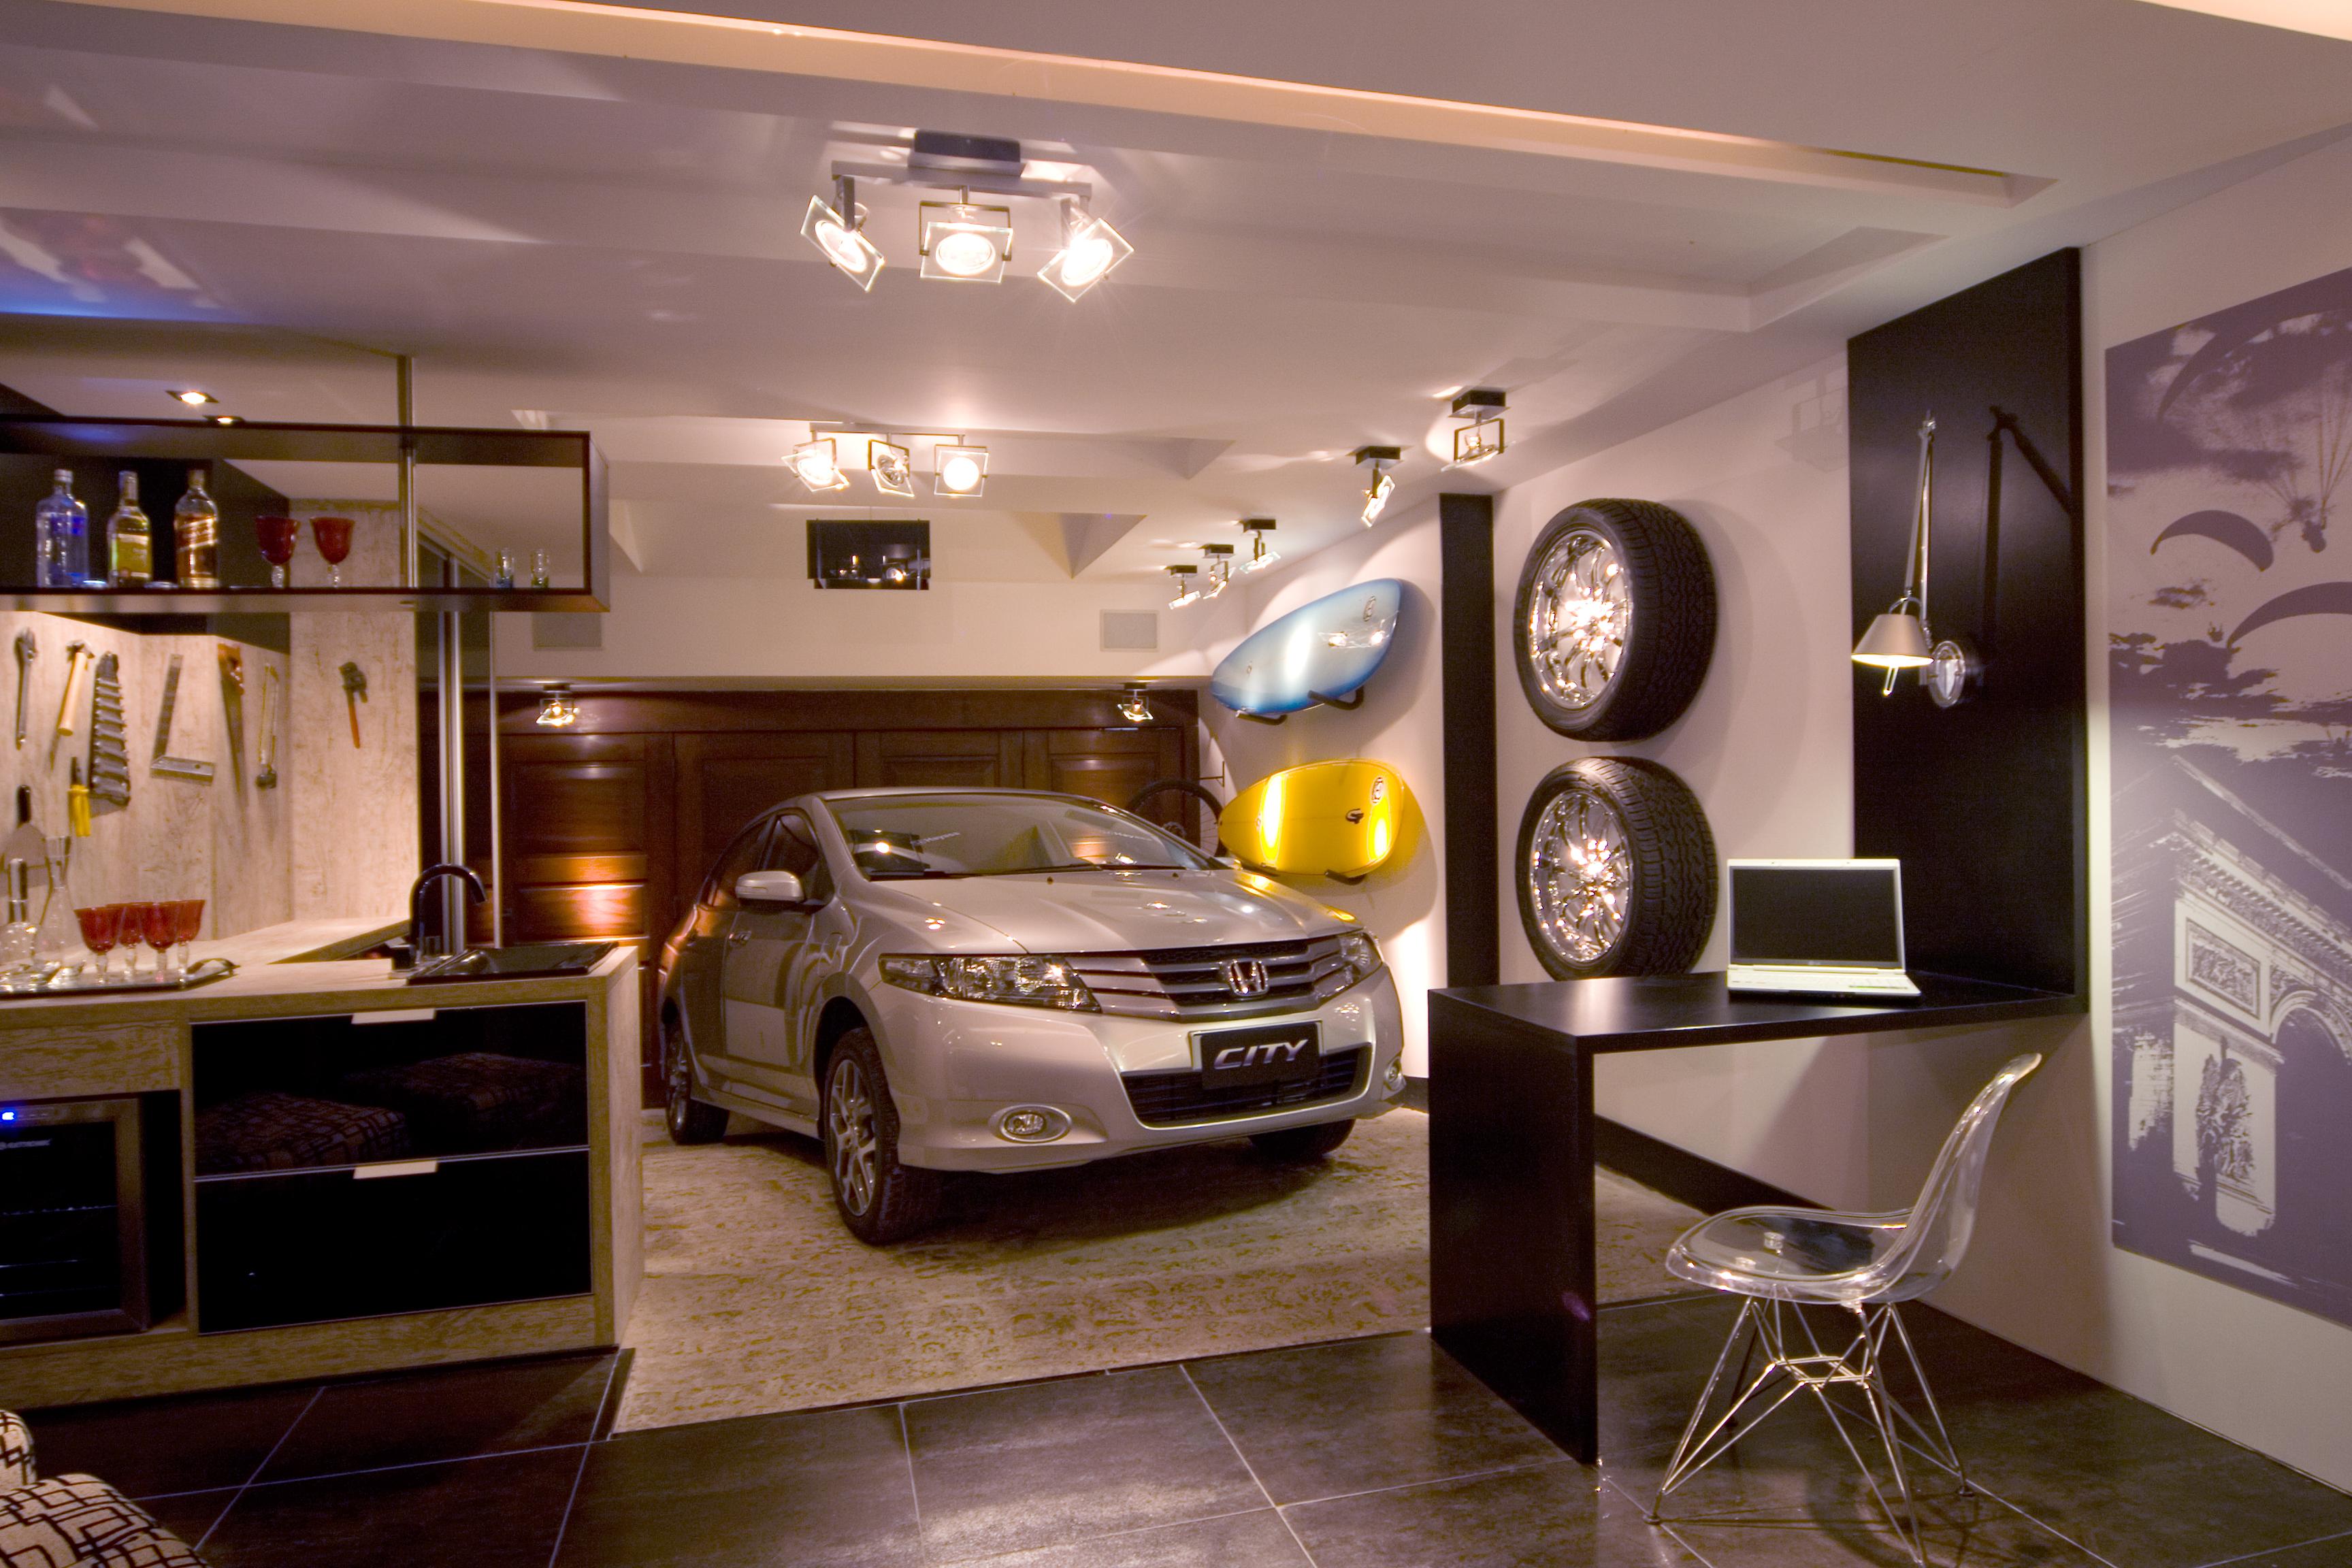 Garagem - Mostra